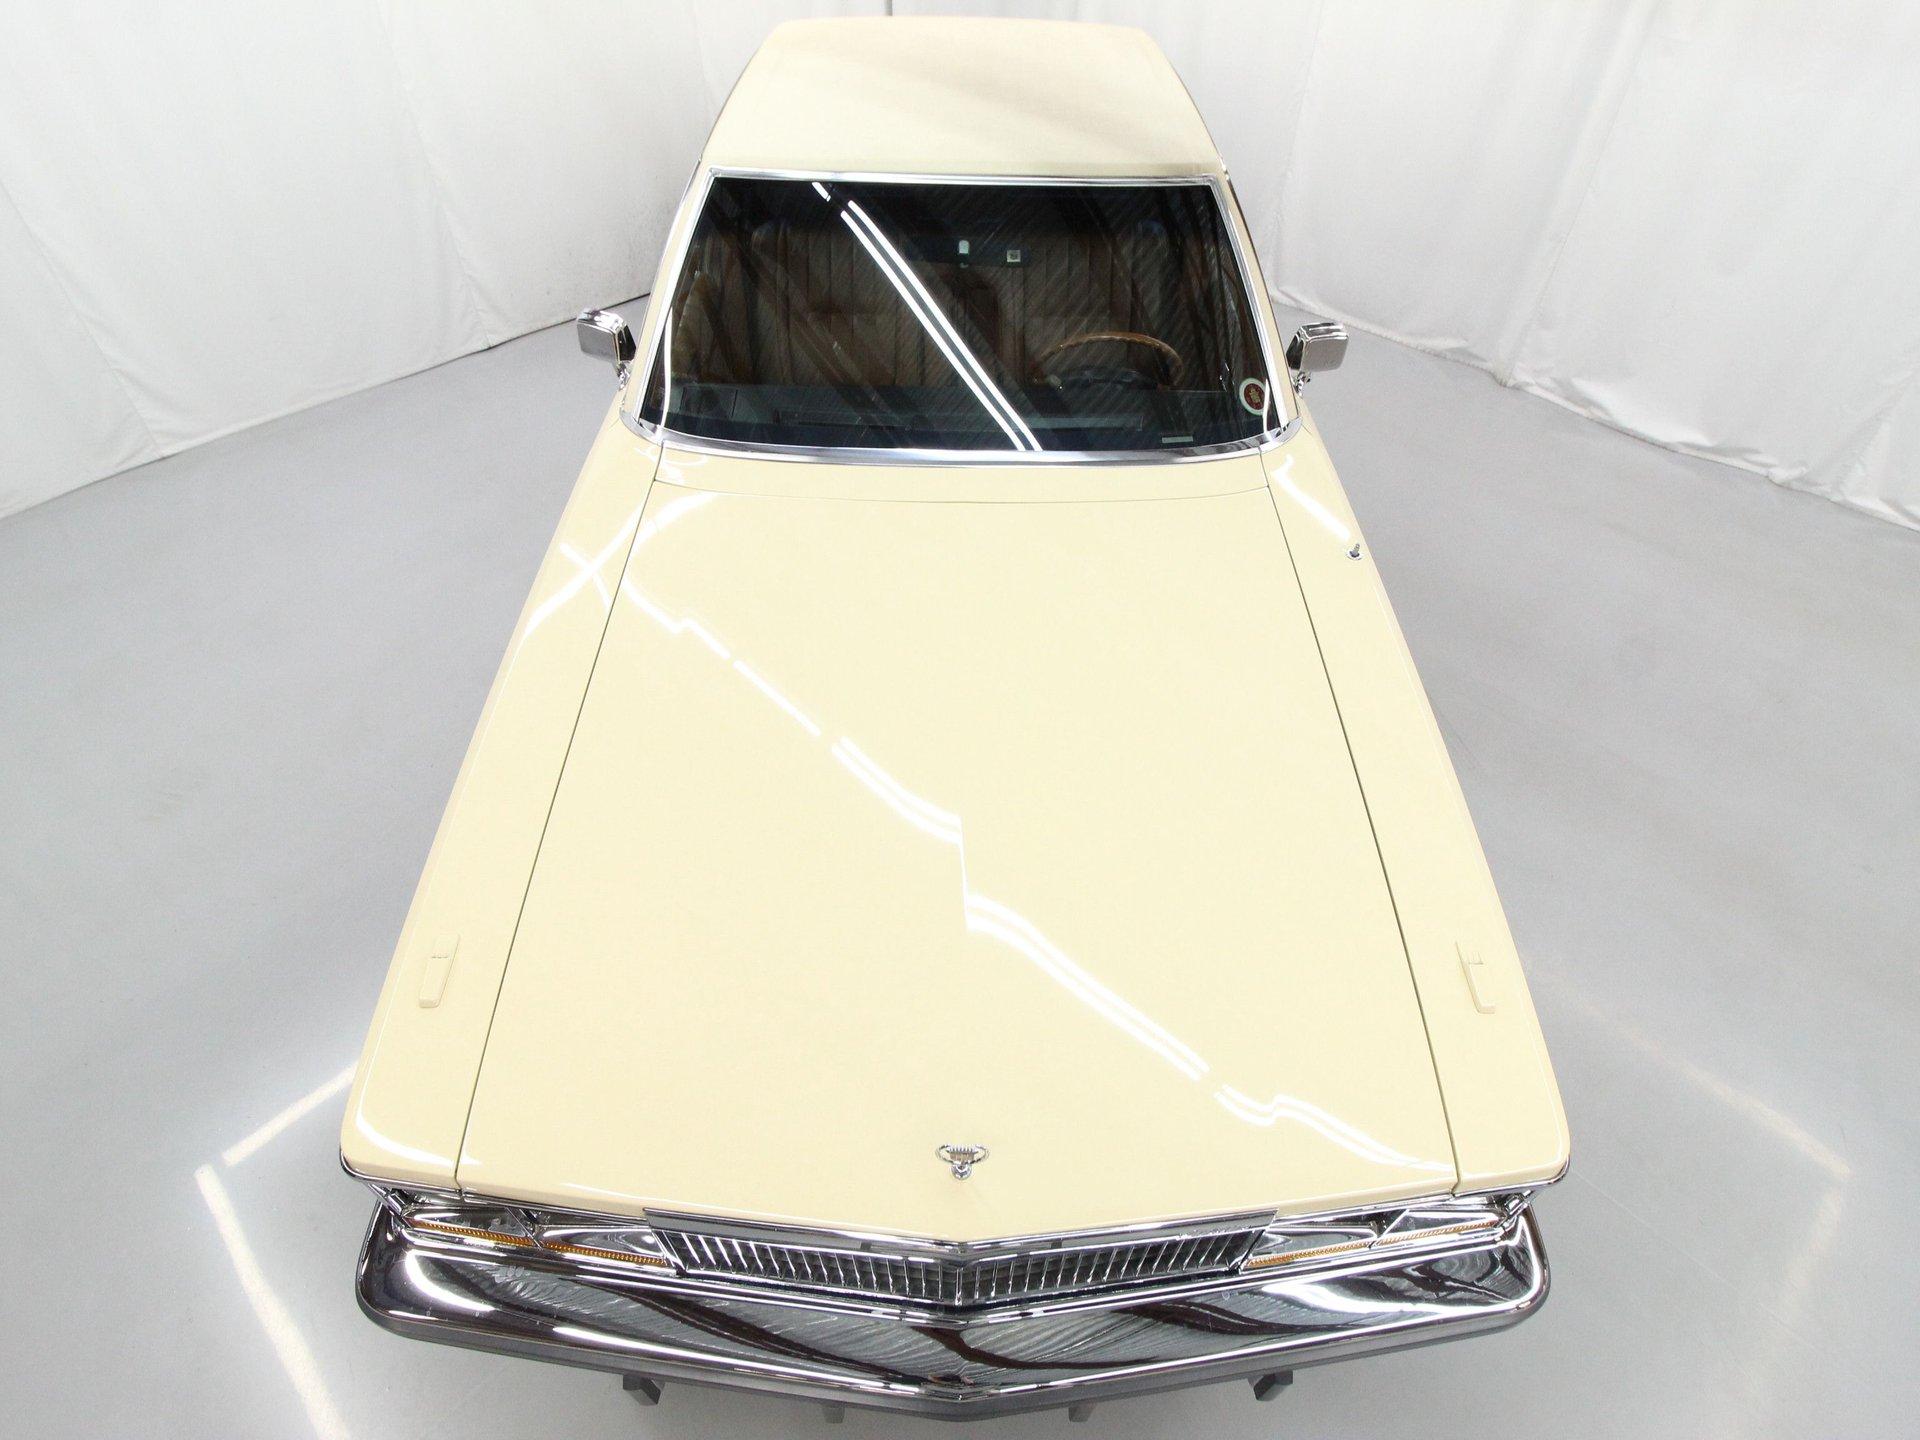 1979 Cadillac Seville